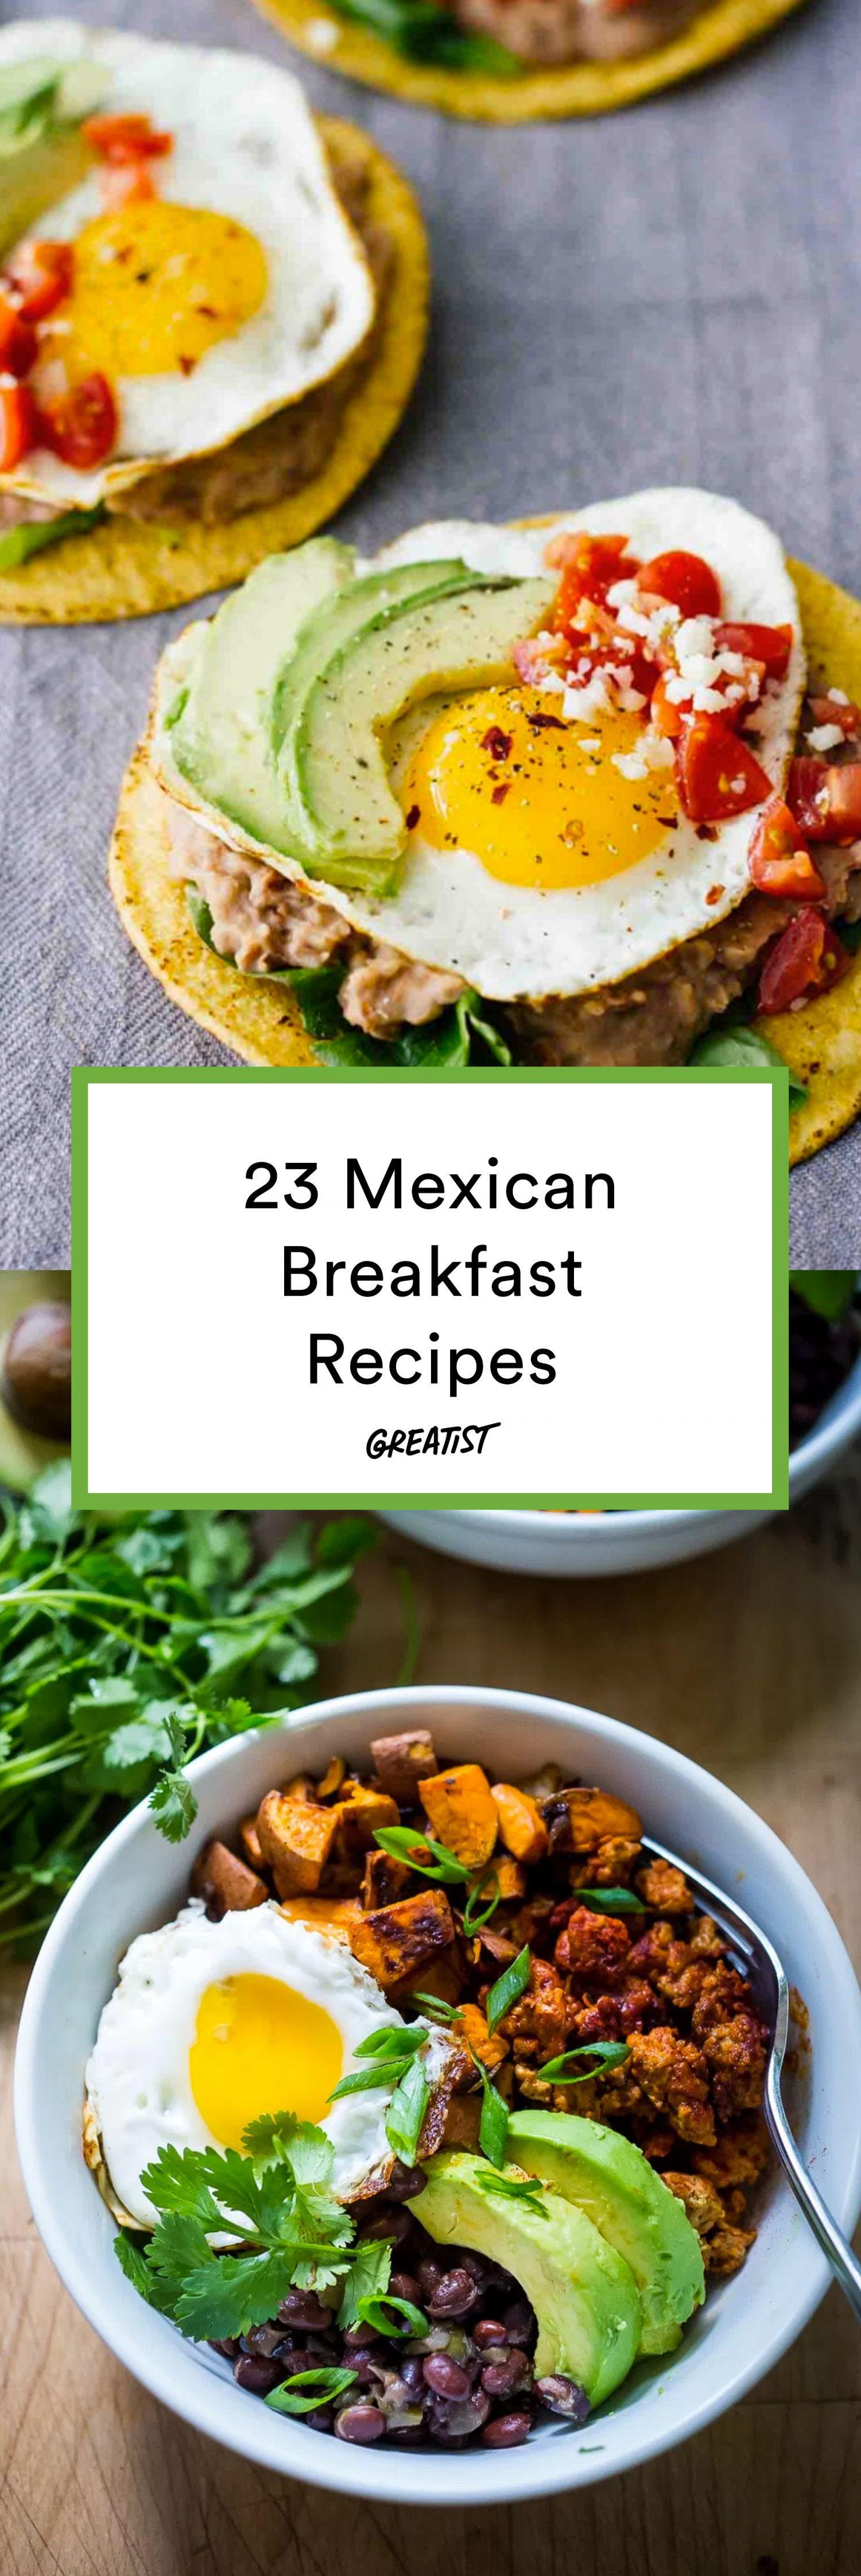 mexican breakfast food recipes